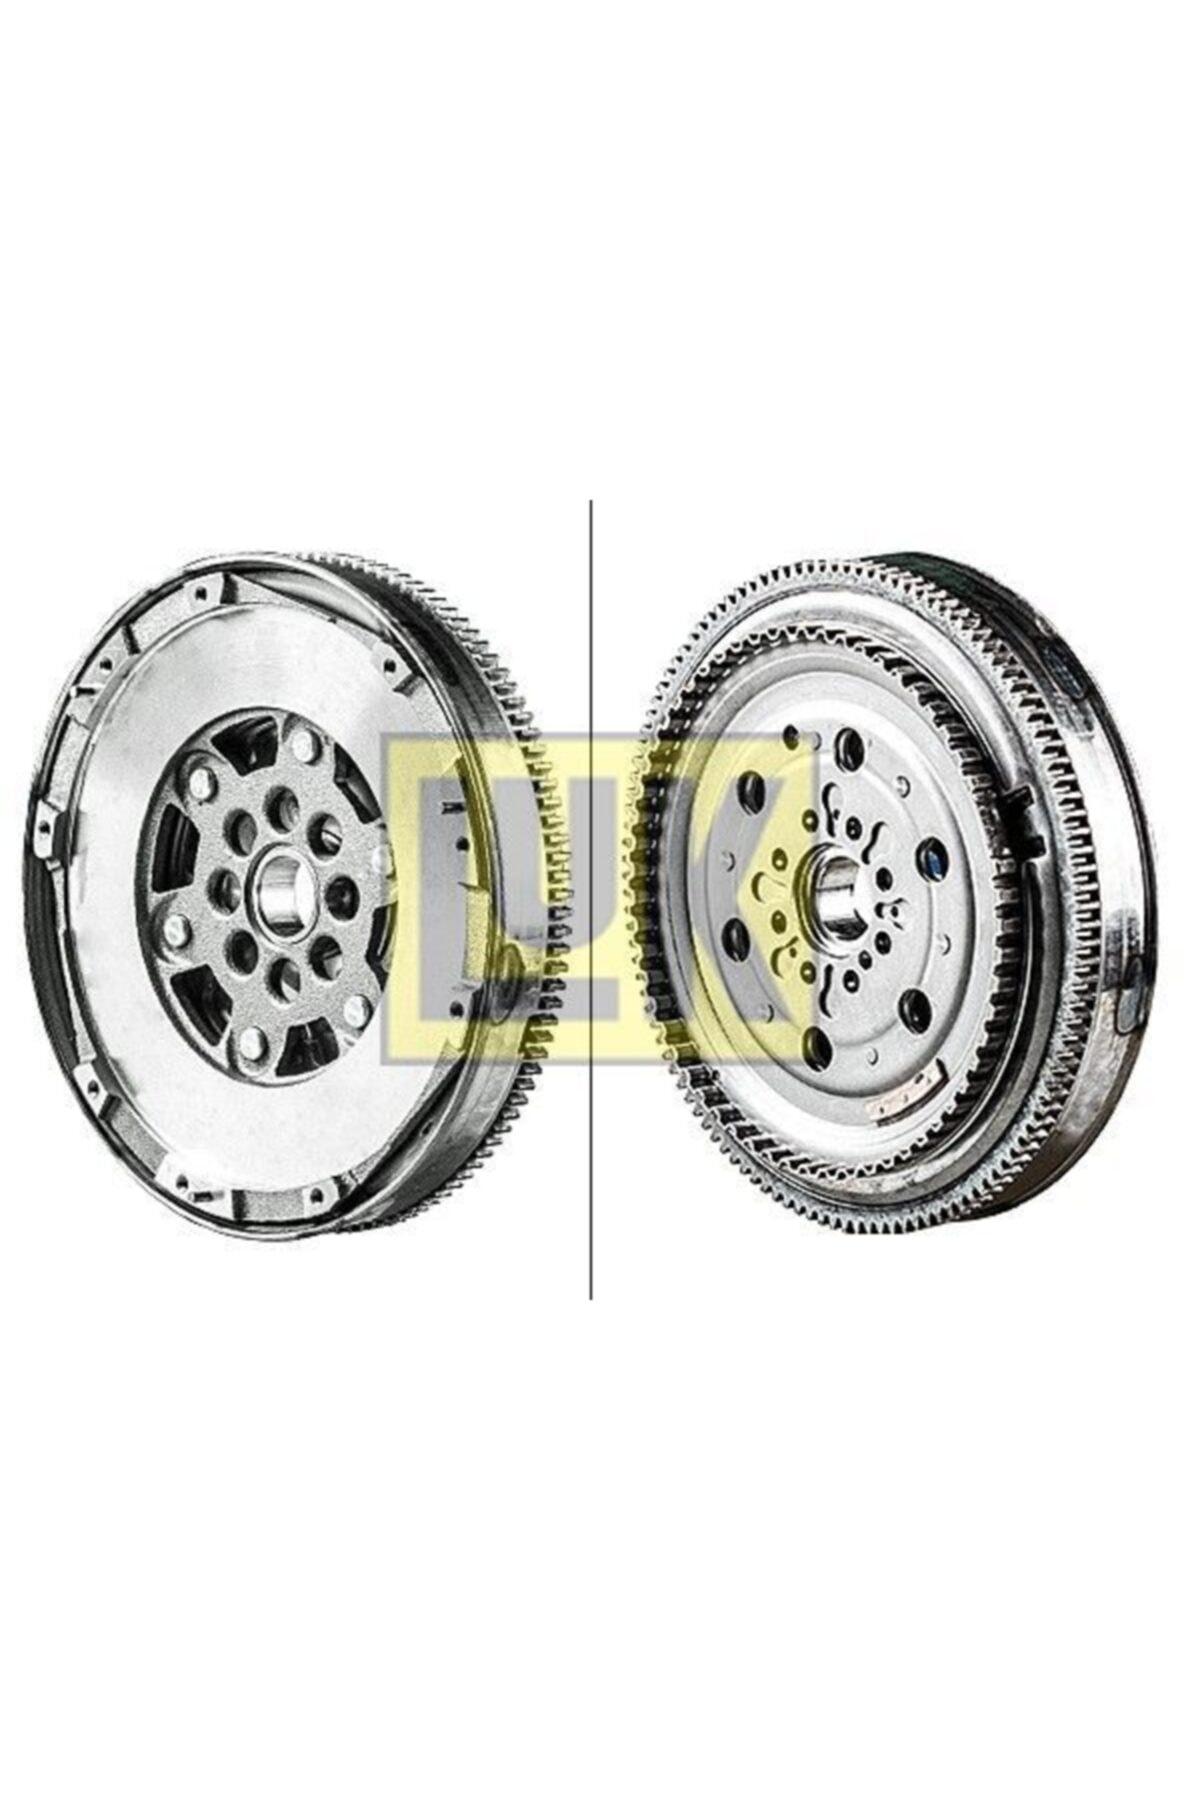 Baysal Volant Corsa C-d Agila Combo Meriva 1.3cdti Z13dt 1